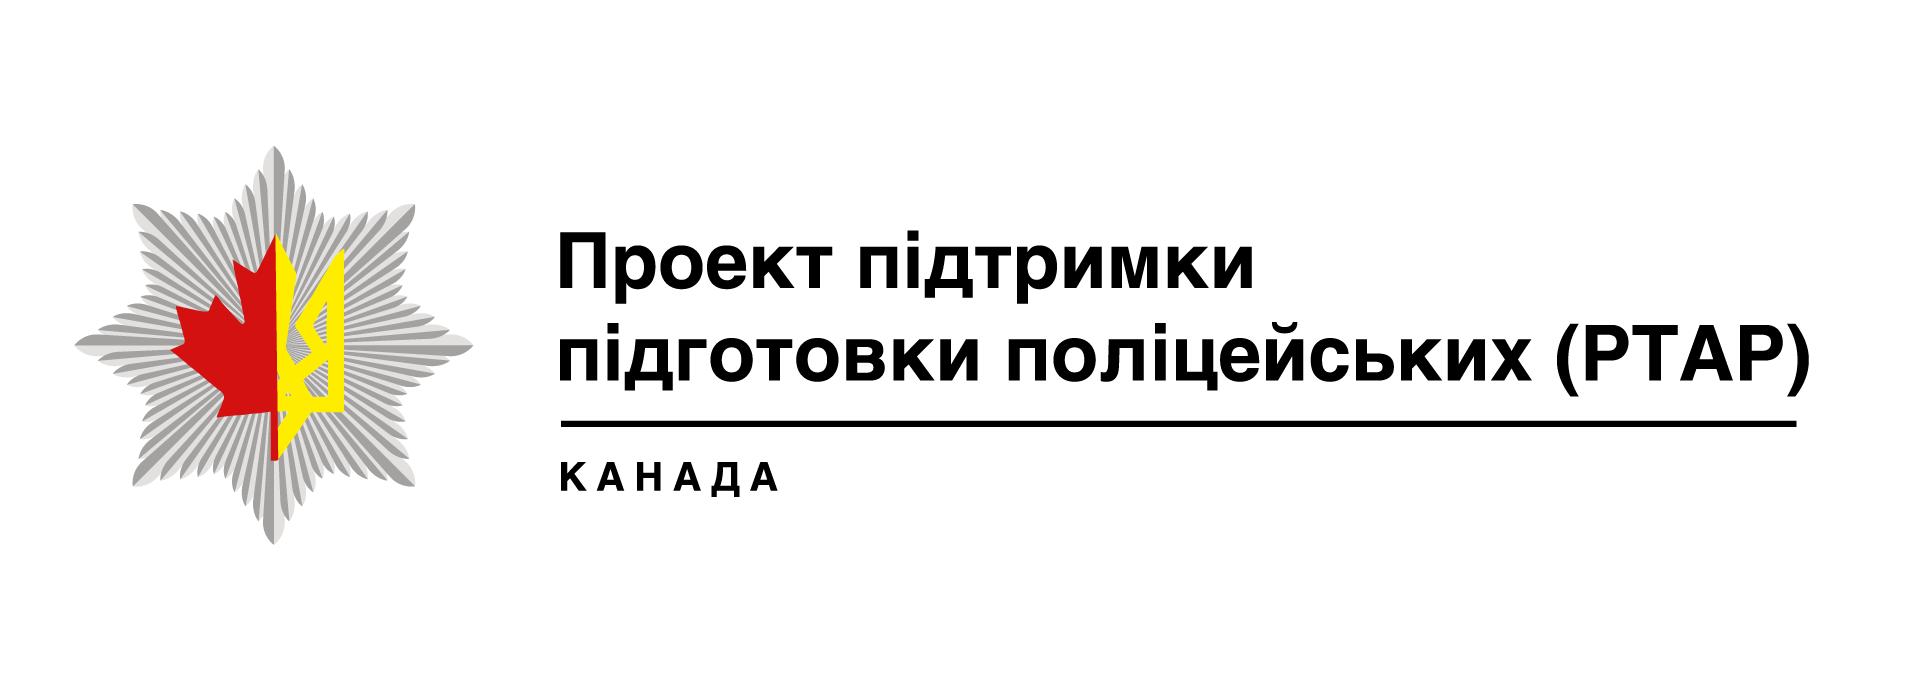 partners-image